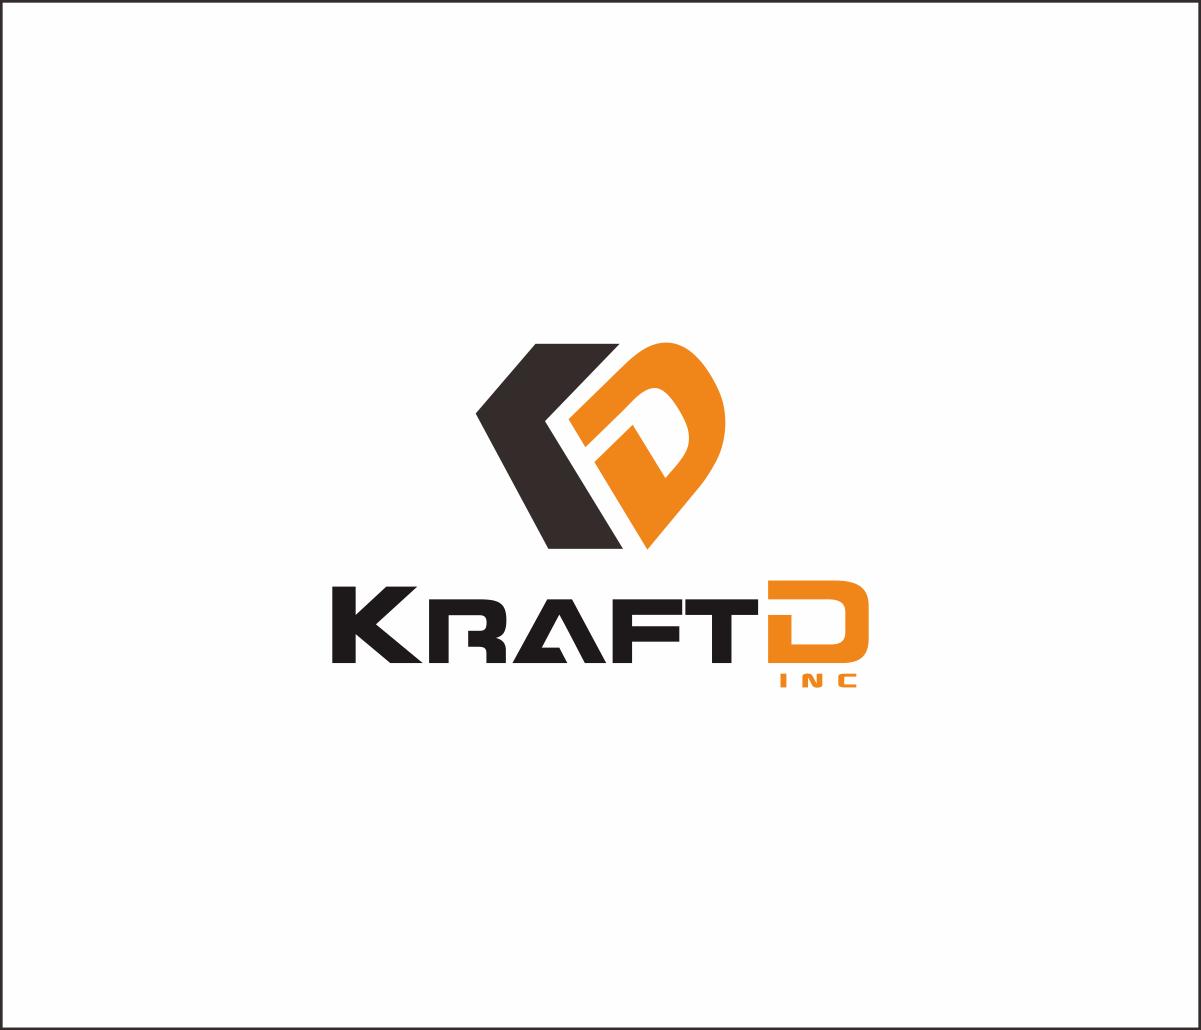 Logo Design by Armada Jamaluddin - Entry No. 277 in the Logo Design Contest Unique Logo Design Wanted for Kraft D Inc.